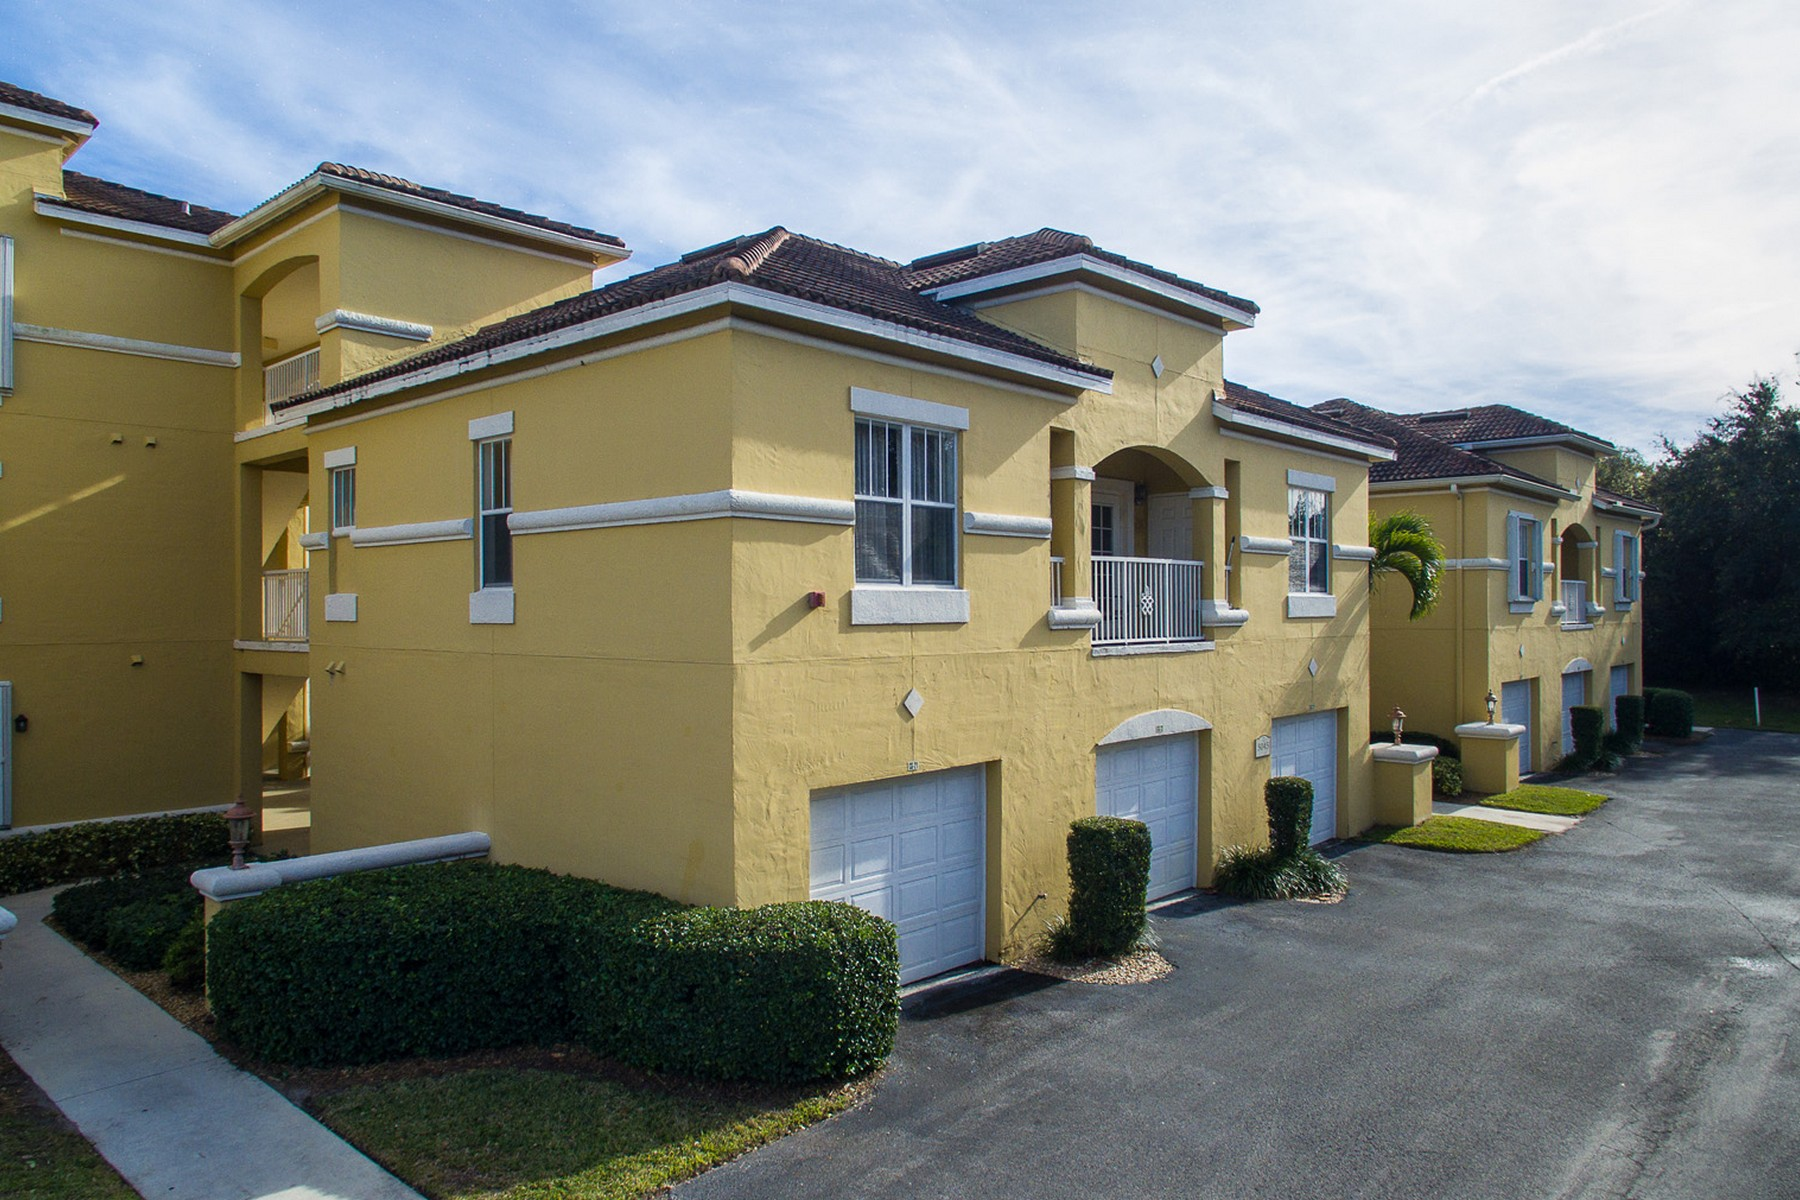 Condominium for Rent at Totally Renovated and Gorgeous Condo at Fairways at Grand Harbor 5045 Fairways Circle #D203 Vero Beach, Florida 32967 United States